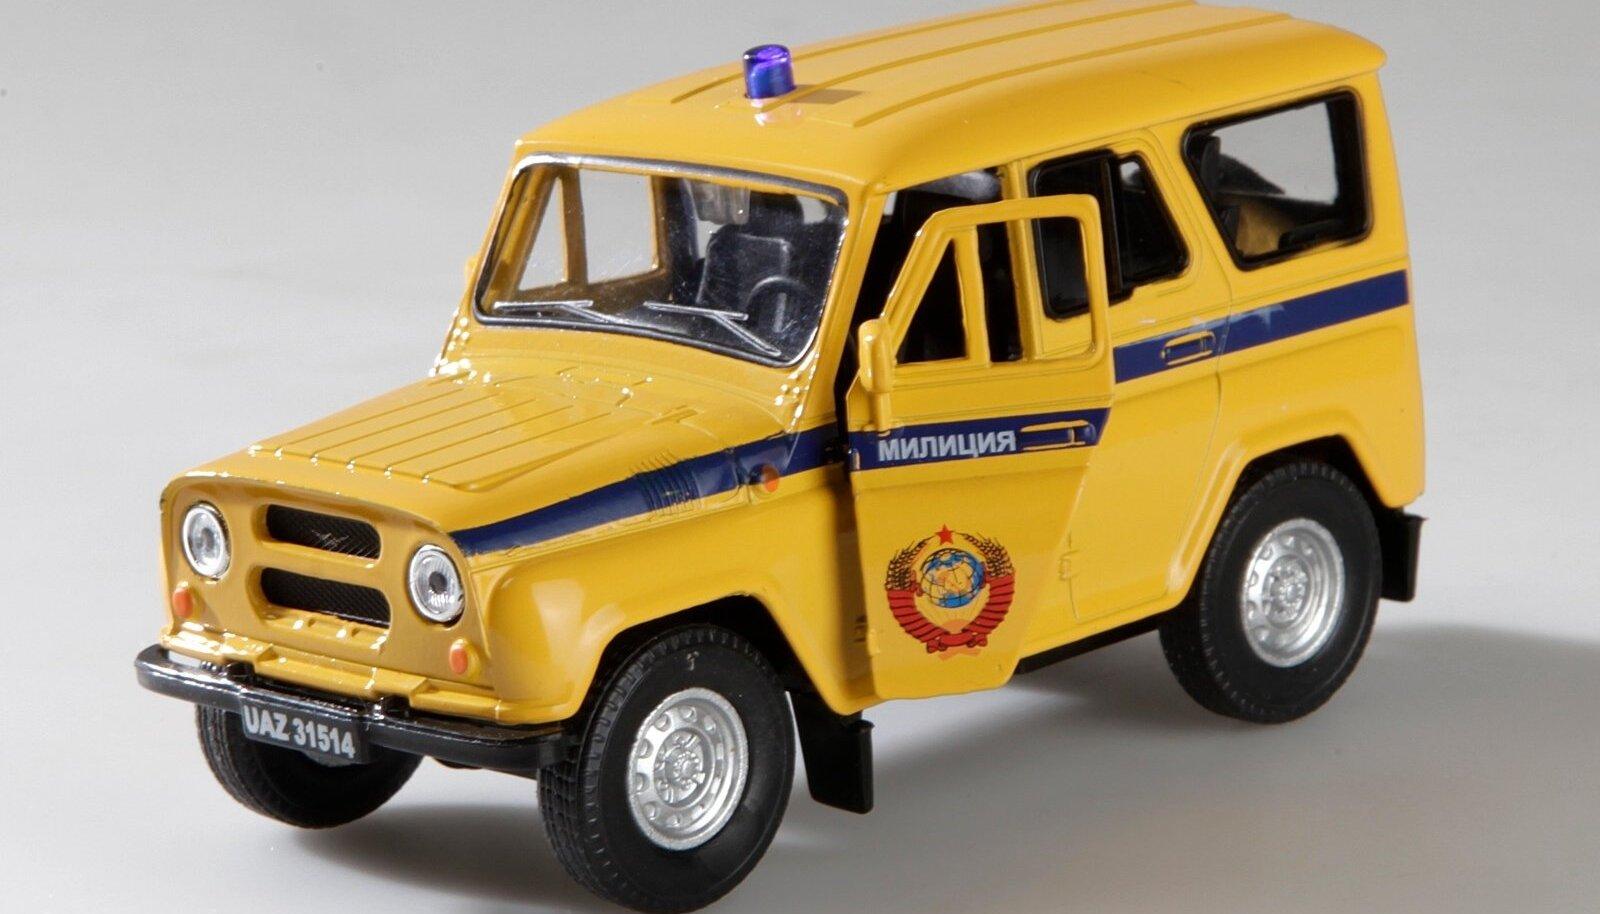 Miilitsaauto mudel